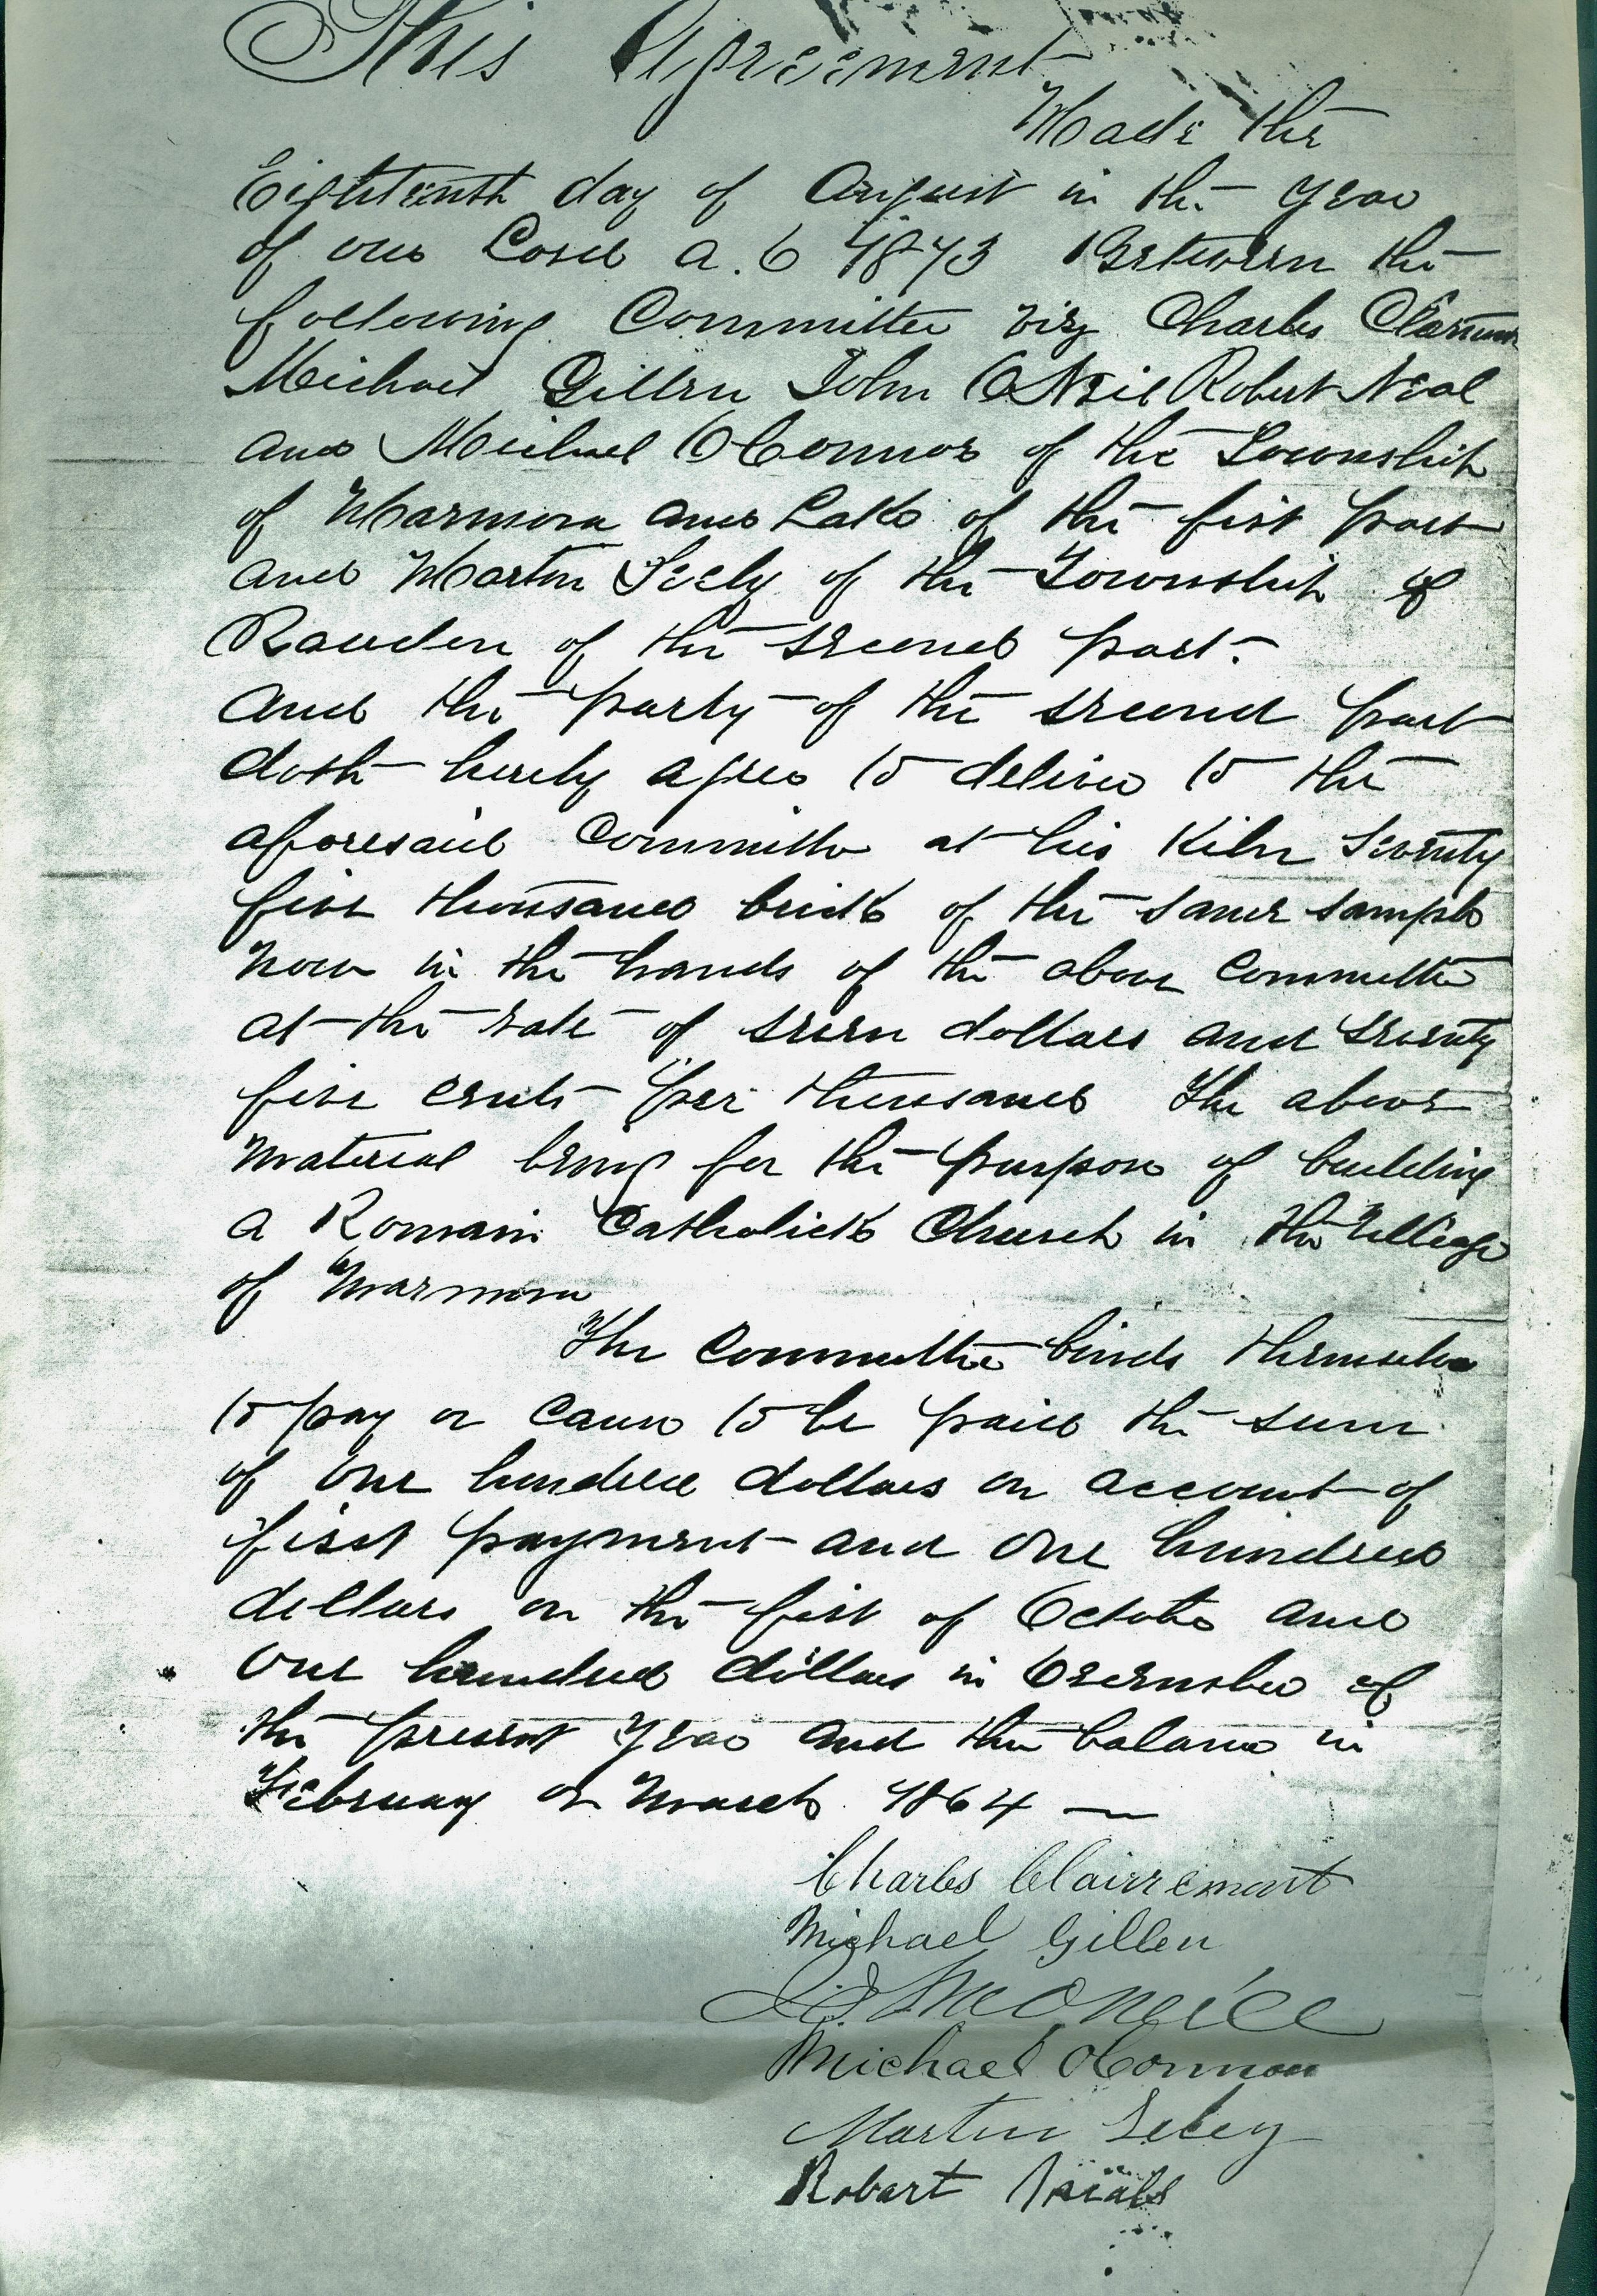 Sacred Heart Church,  Agreemt to buy  75,000 bricks for $7.75 per thousand, Aug. 1873.jpg